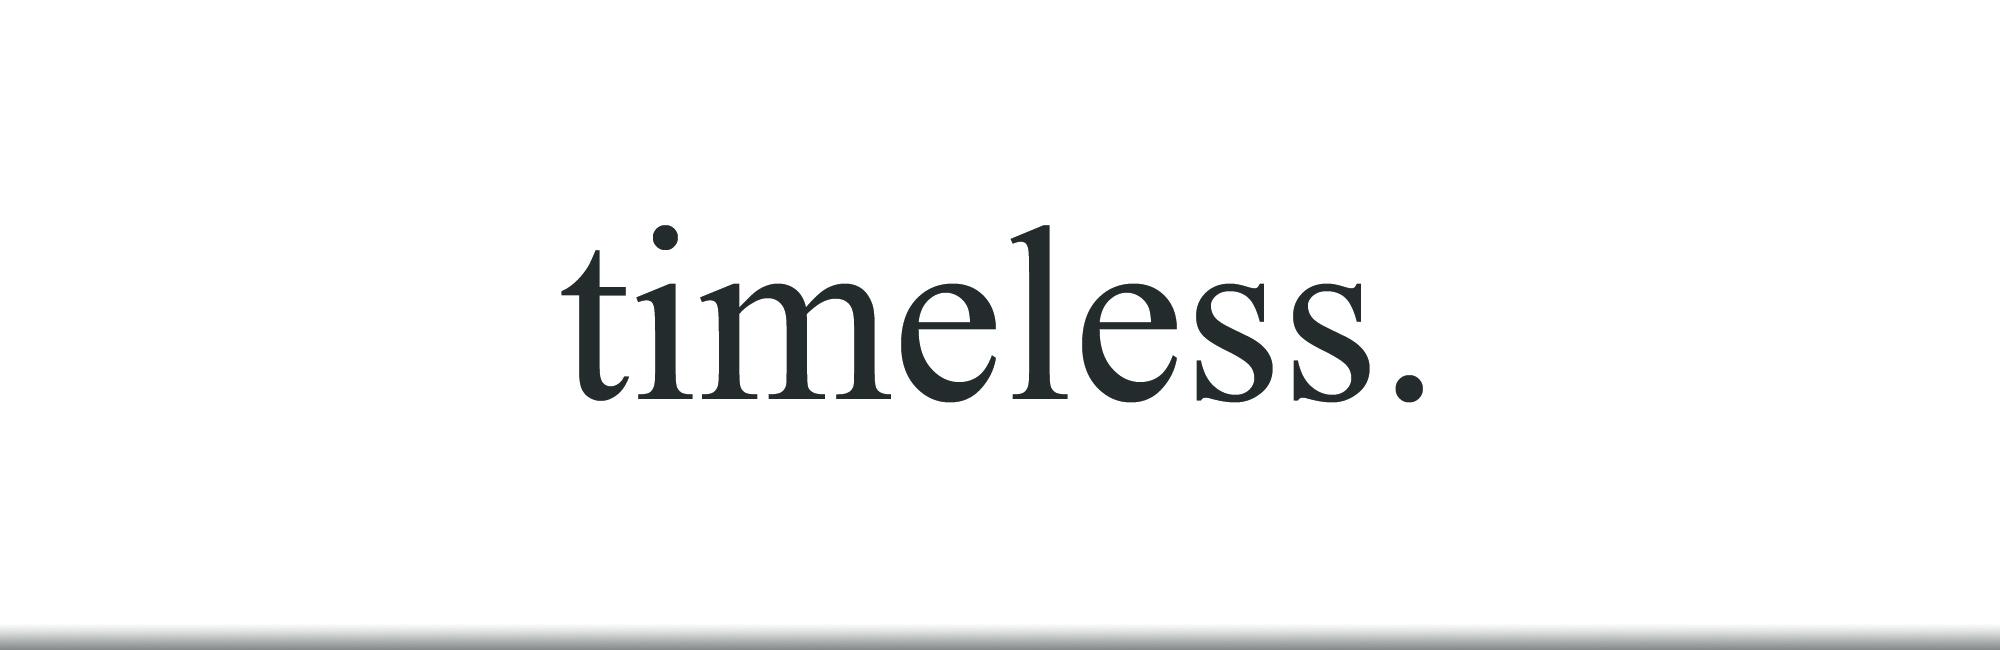 Timeless - Sermon Web Header